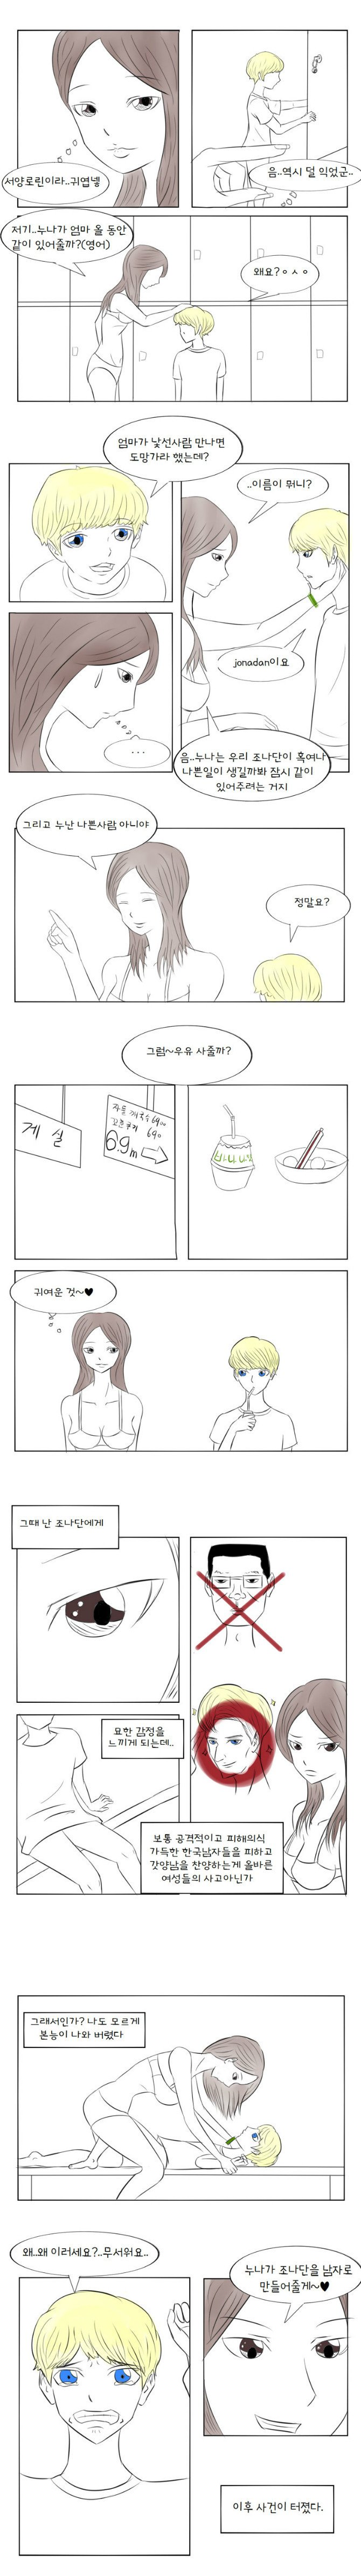 2.jpg 목욕탕에서 서양남자 농락한 썰♡ 목욕탕에서 서양 로린이 농락한 썰.manhwa